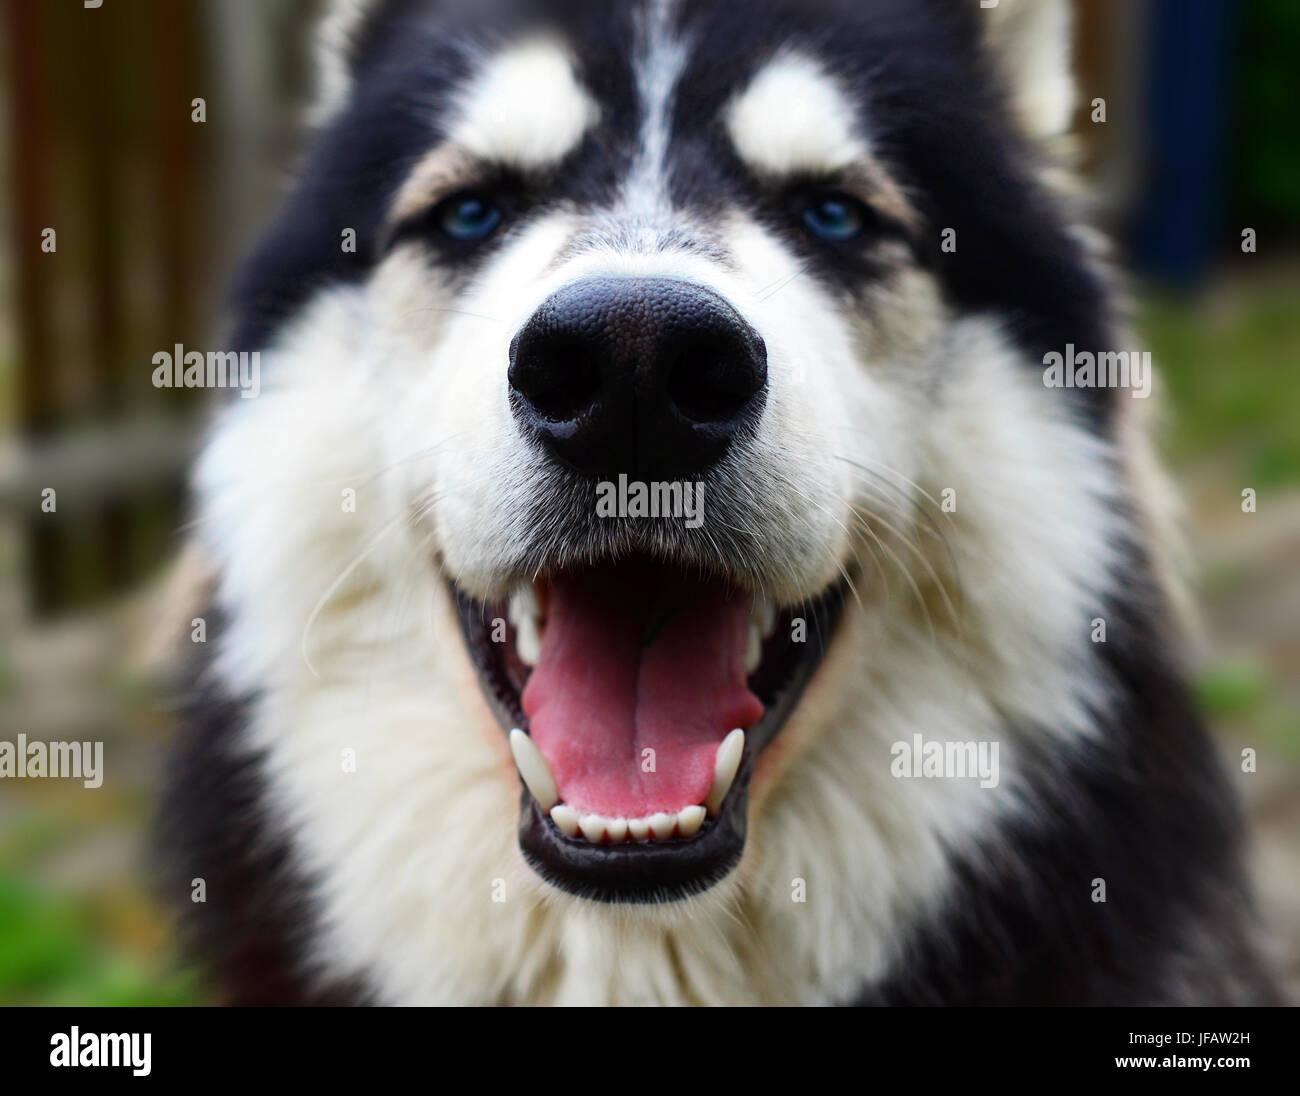 Happy Siberian Husky smiling into camera, close up view - Stock Image